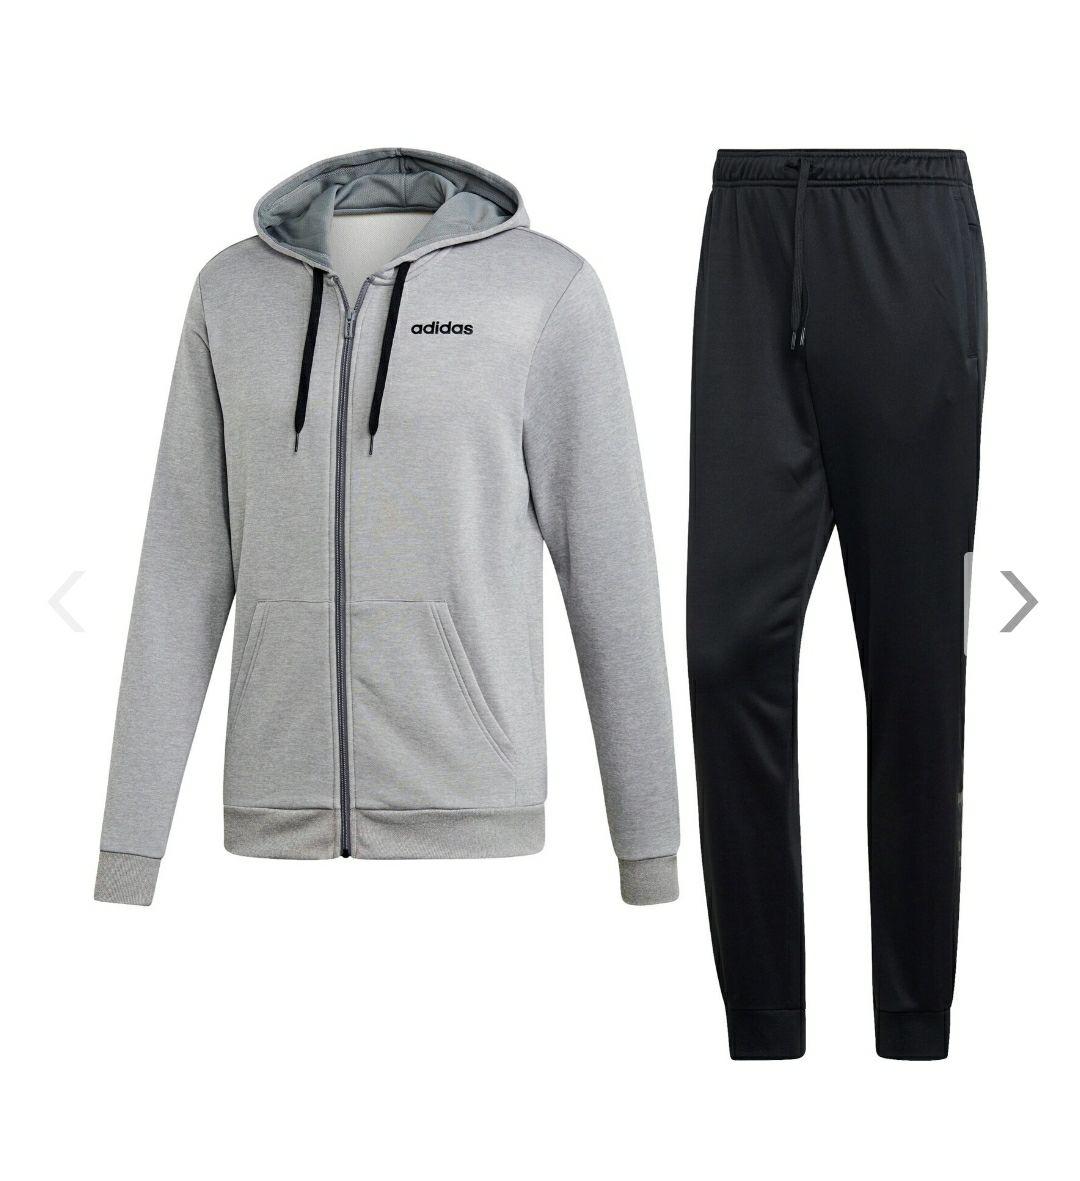 ADIDAS Herren Linear French Terry Hoodie Trainingsanzug ( Grösse M ) Bestprice